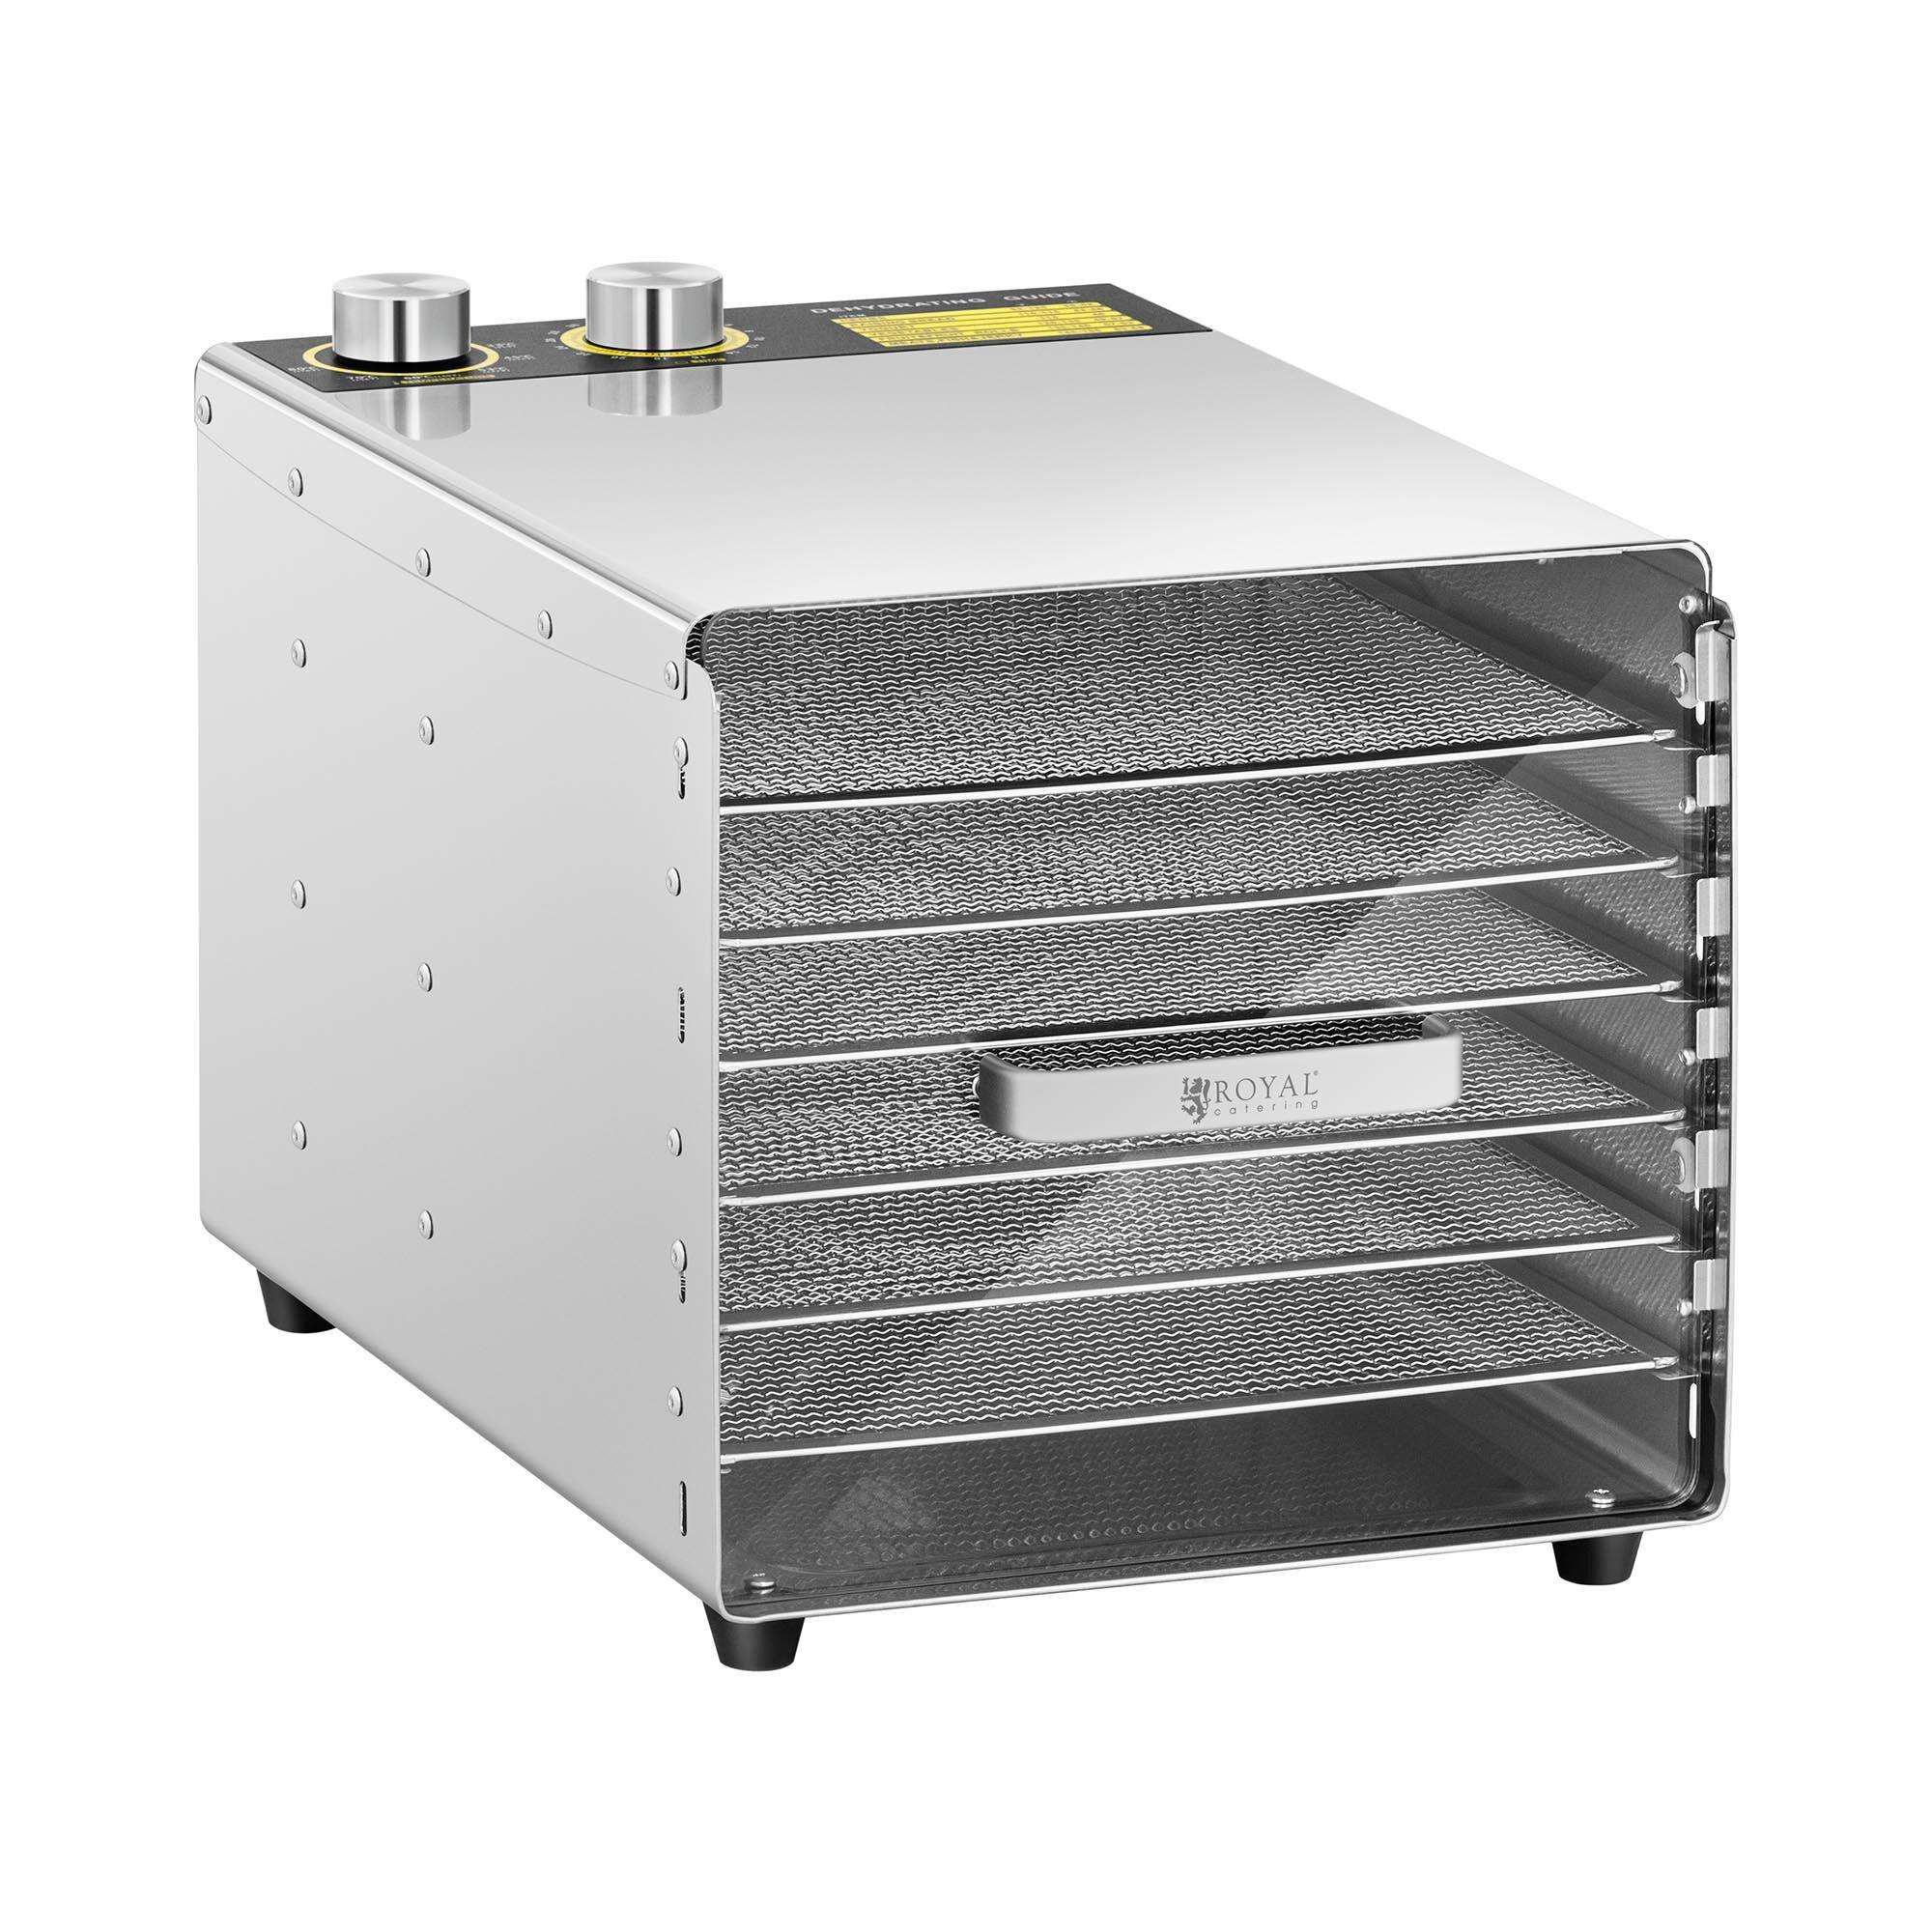 royal catering essiccatore per alimenti professionale - 500 w - 6 ripiani rcda-500/23s